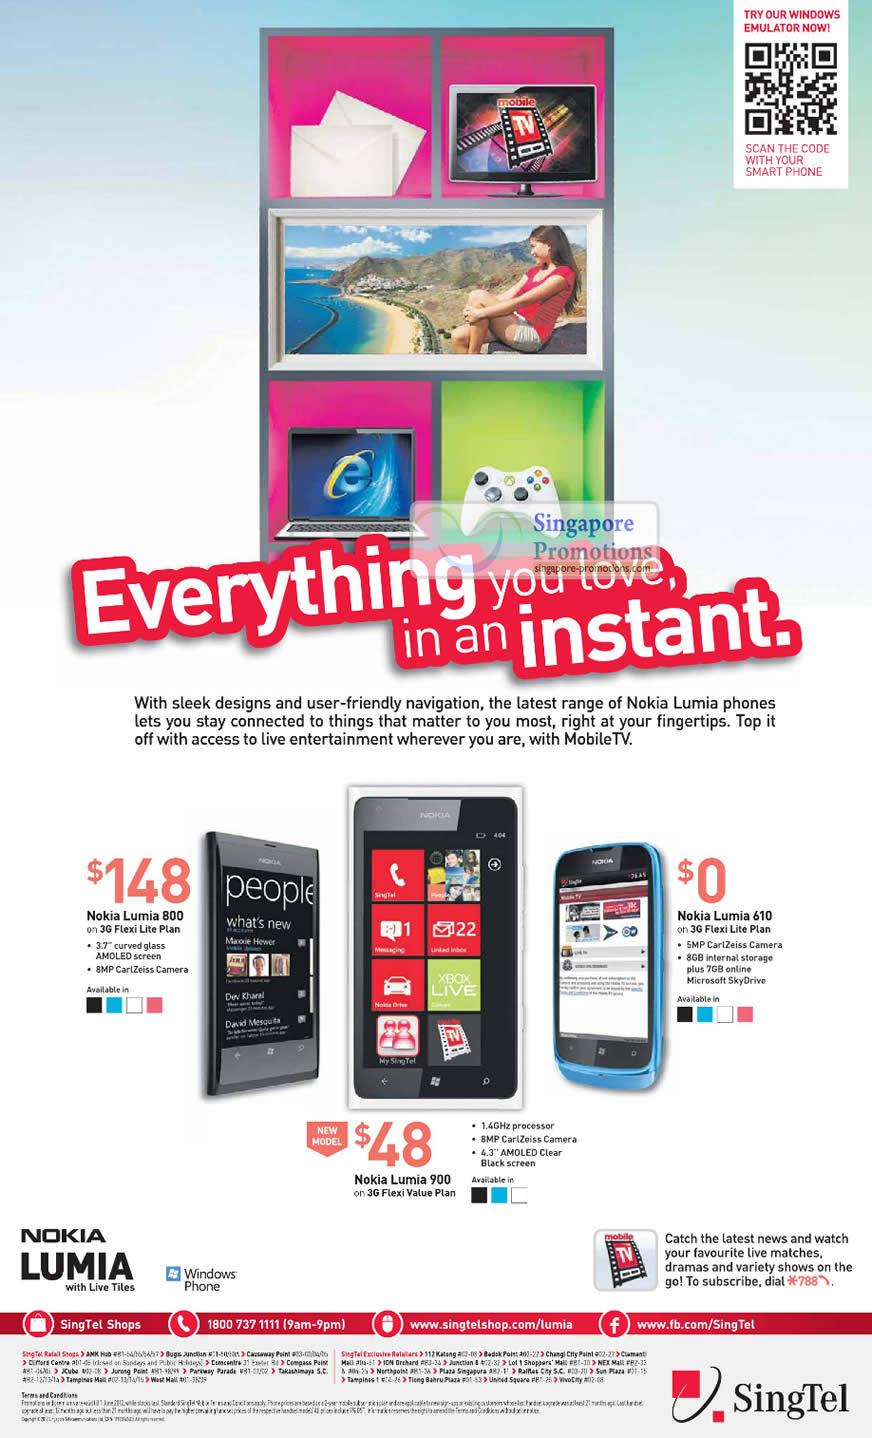 Nokia Lumia 800, Nokia Lumia 900, Nokia Lumia 610